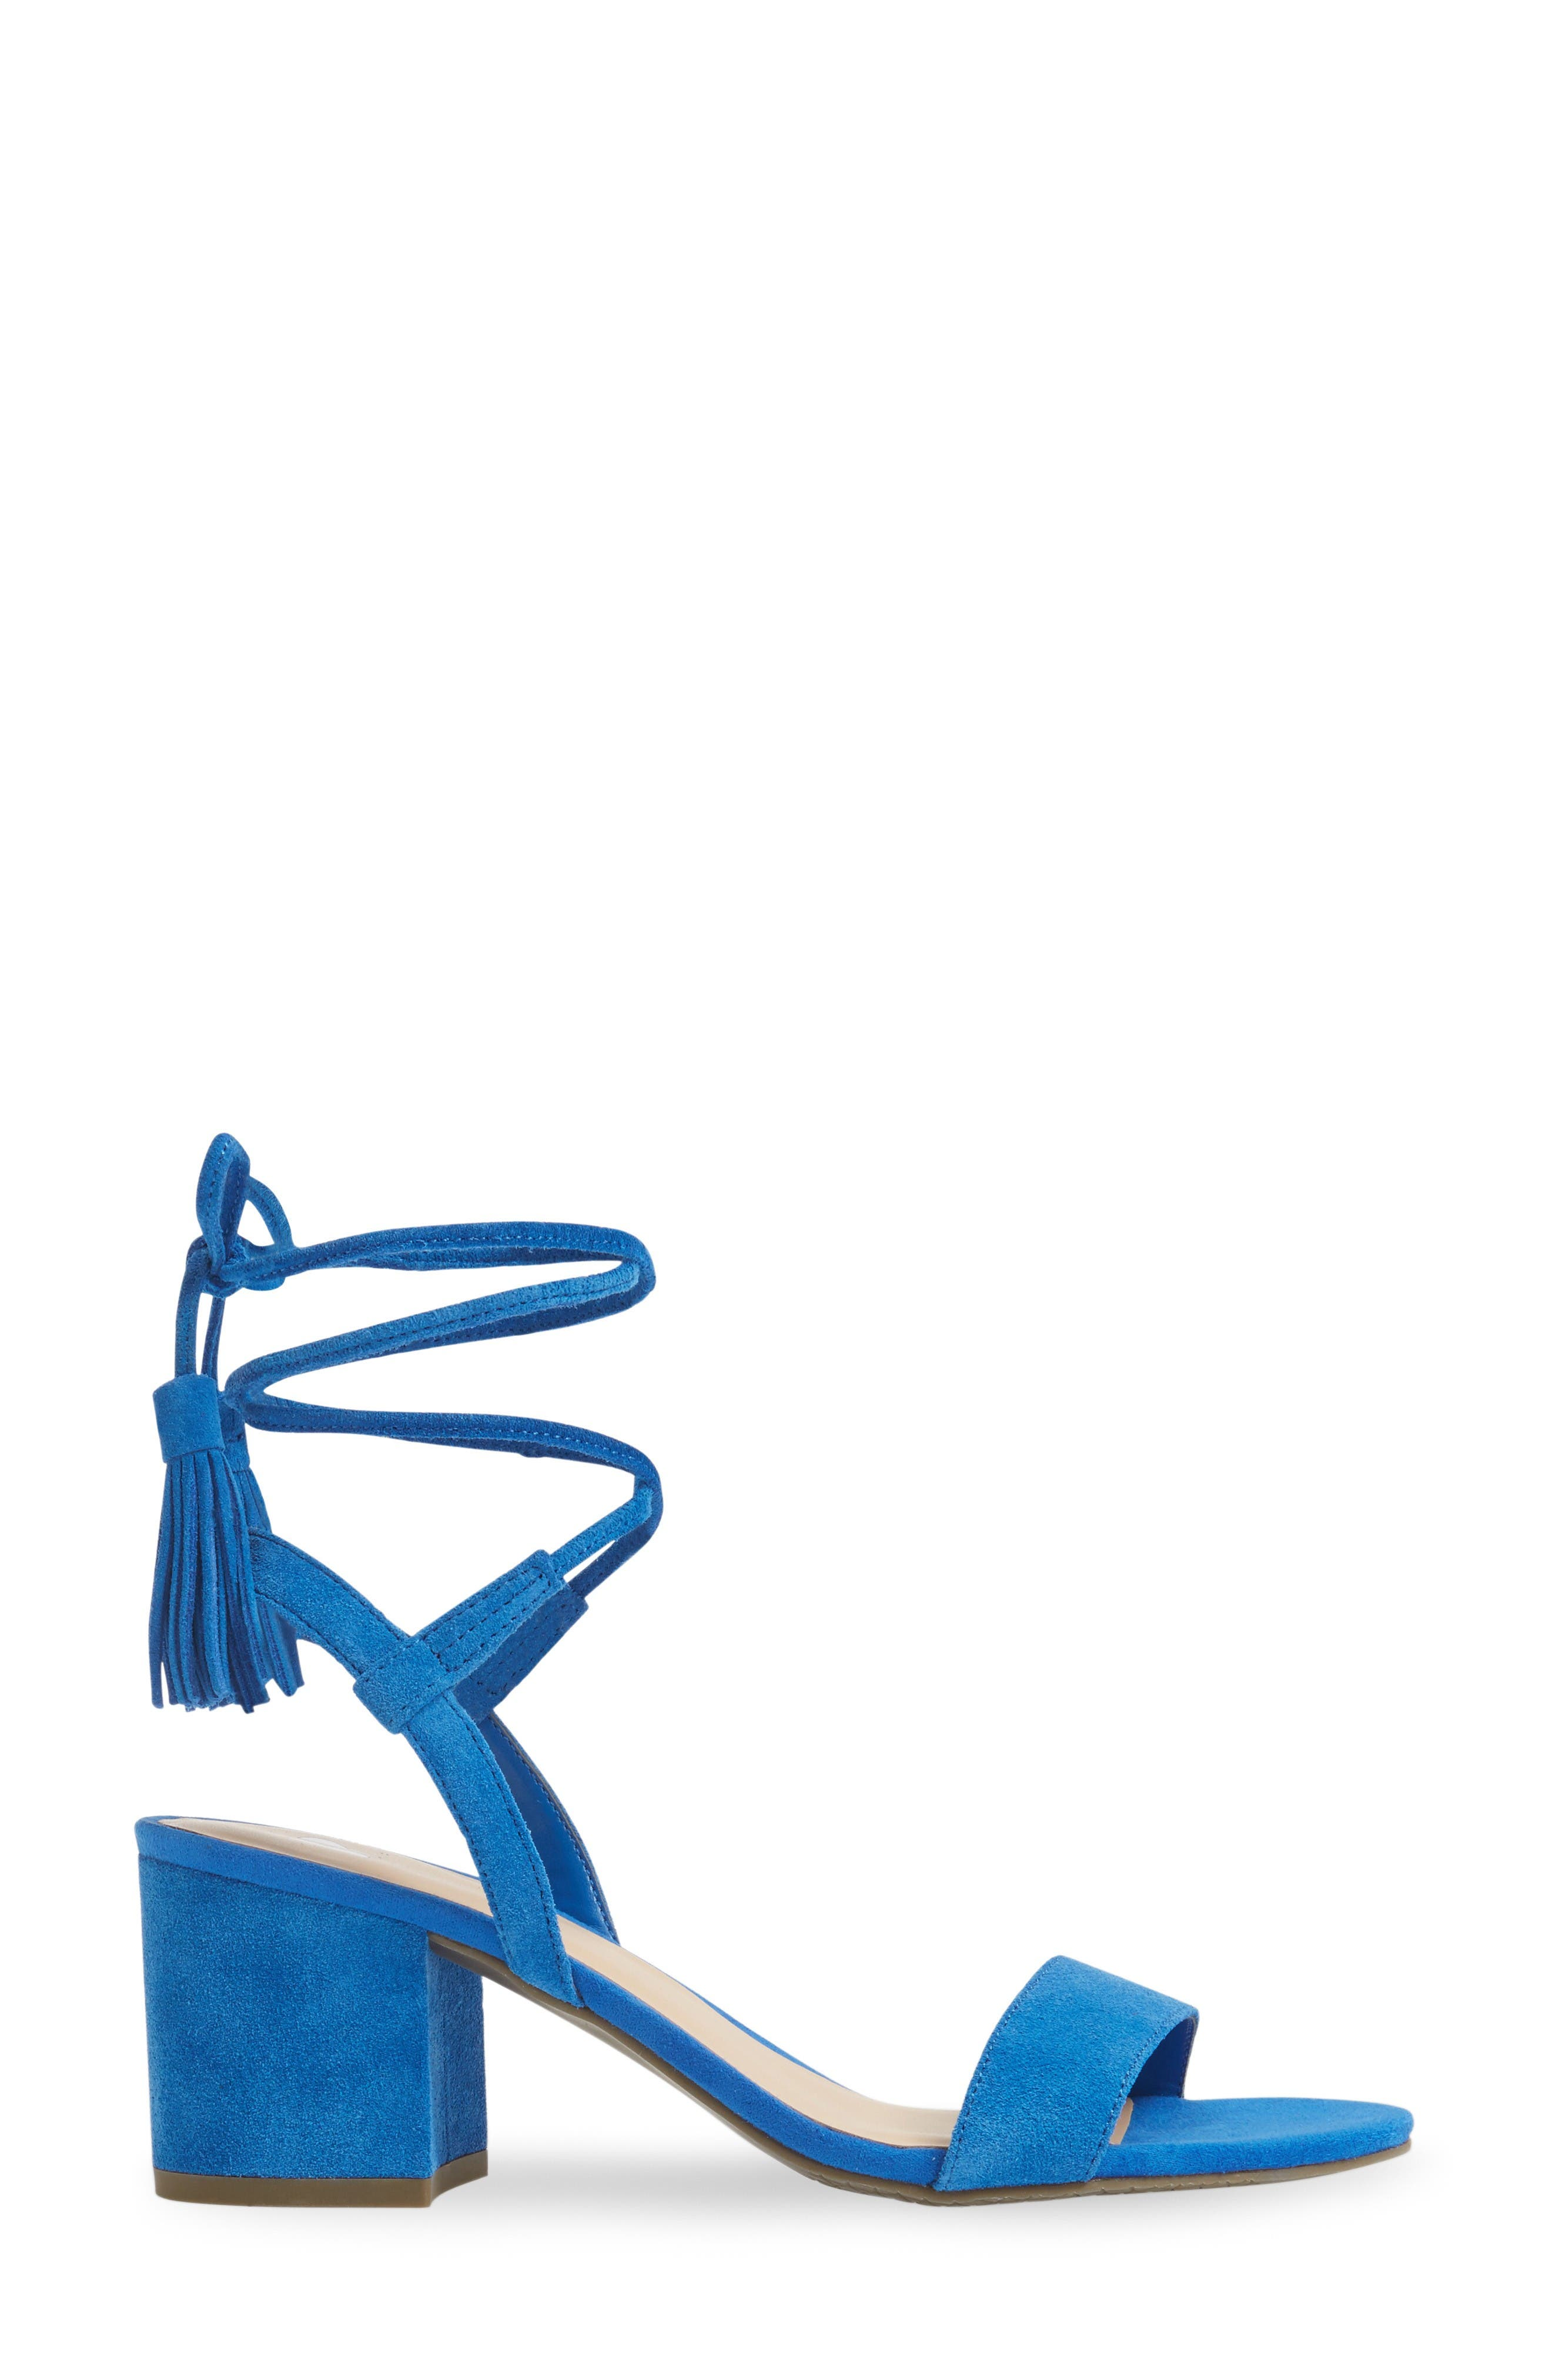 Alternate Image 3  - BP. Karla Block Heel Ankle Wrap Sandal (Women)